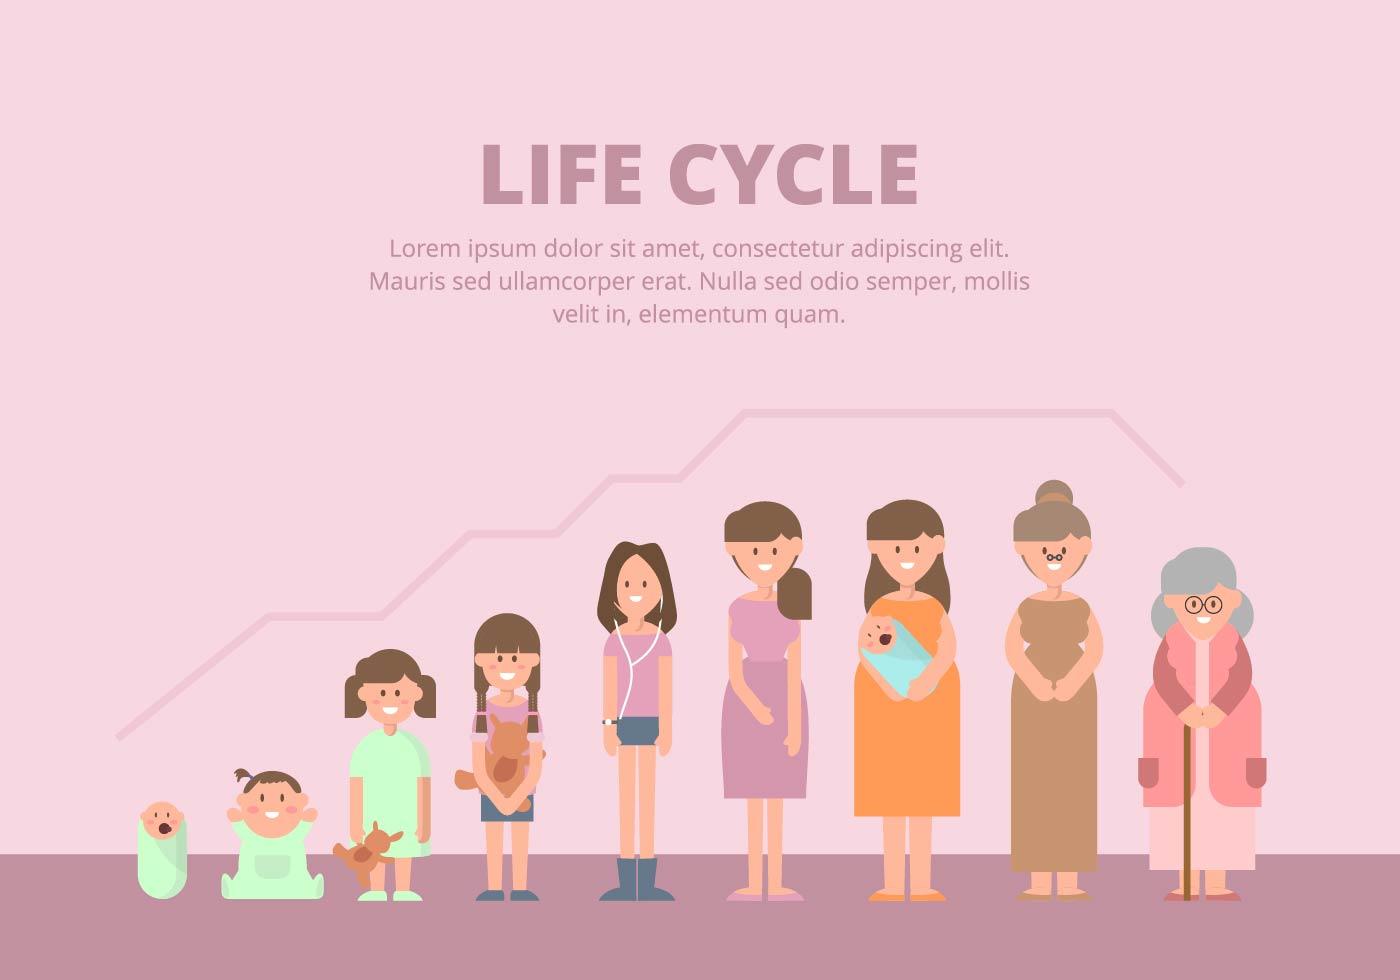 Life Cycle Illustration